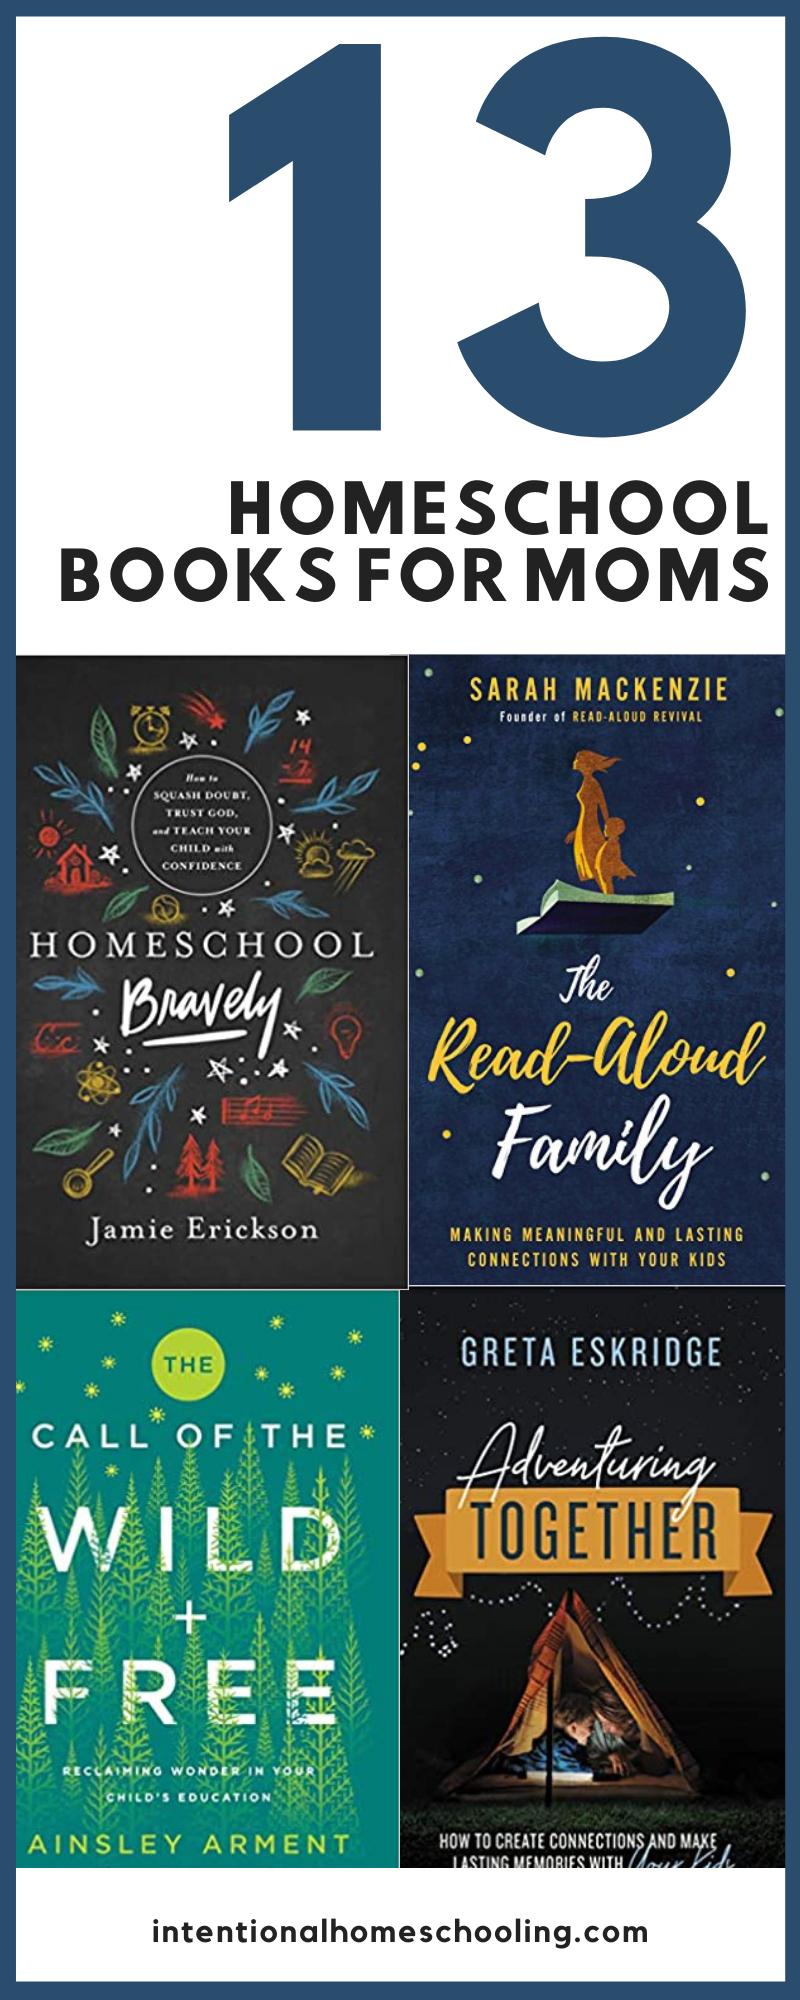 13 Great Homeschool Books for Moms - great parenting and homeschool books to help you on your homeschool journey